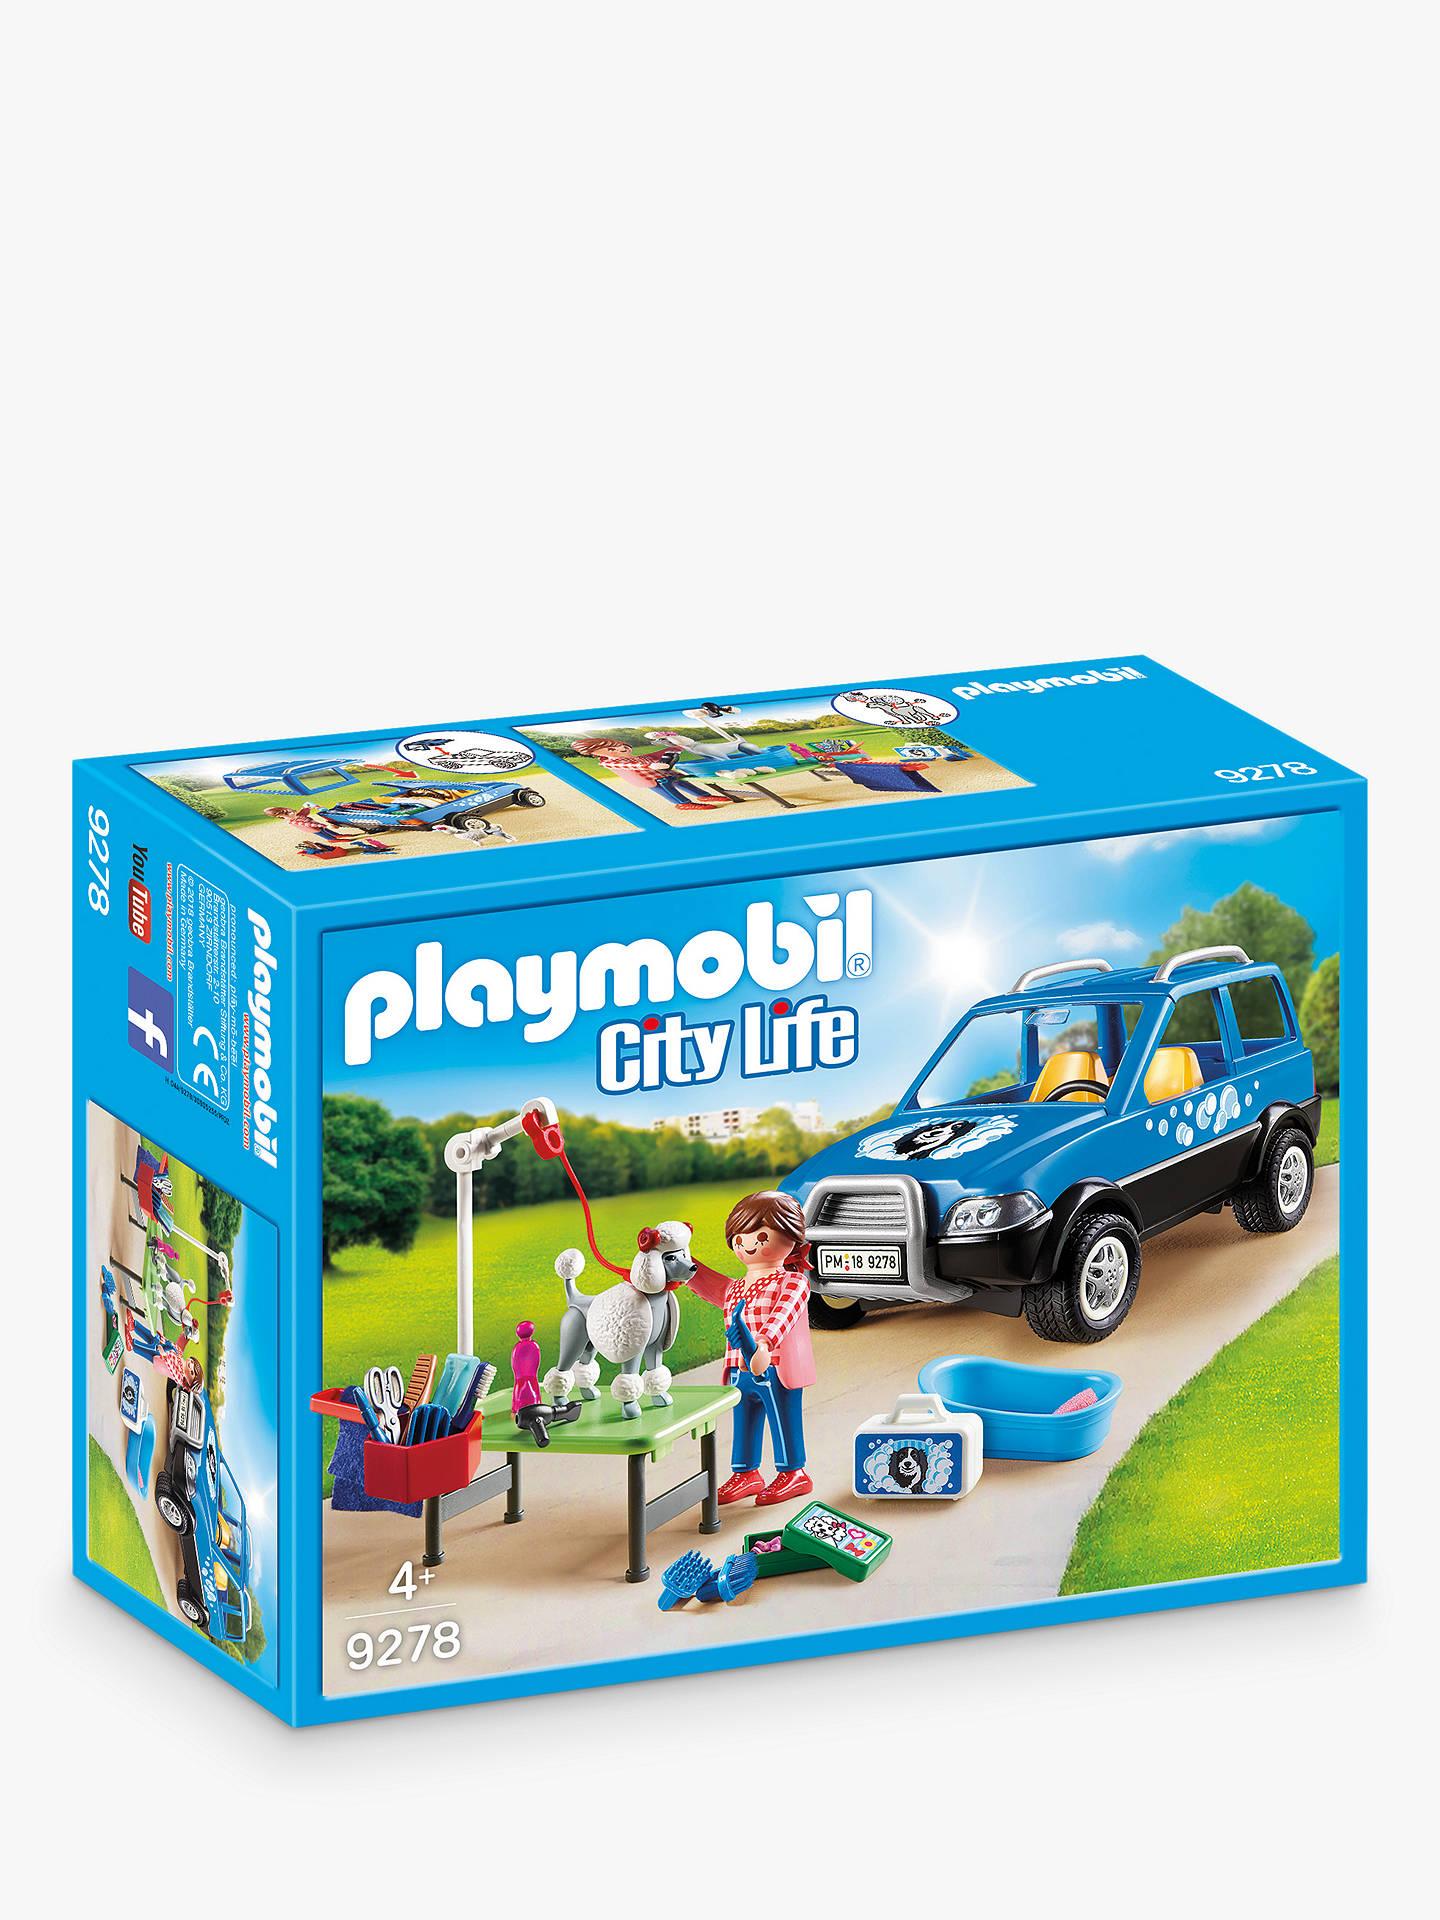 Playmobil City Life 9278 Mobile Pet Groomer at John Lewis & Partners